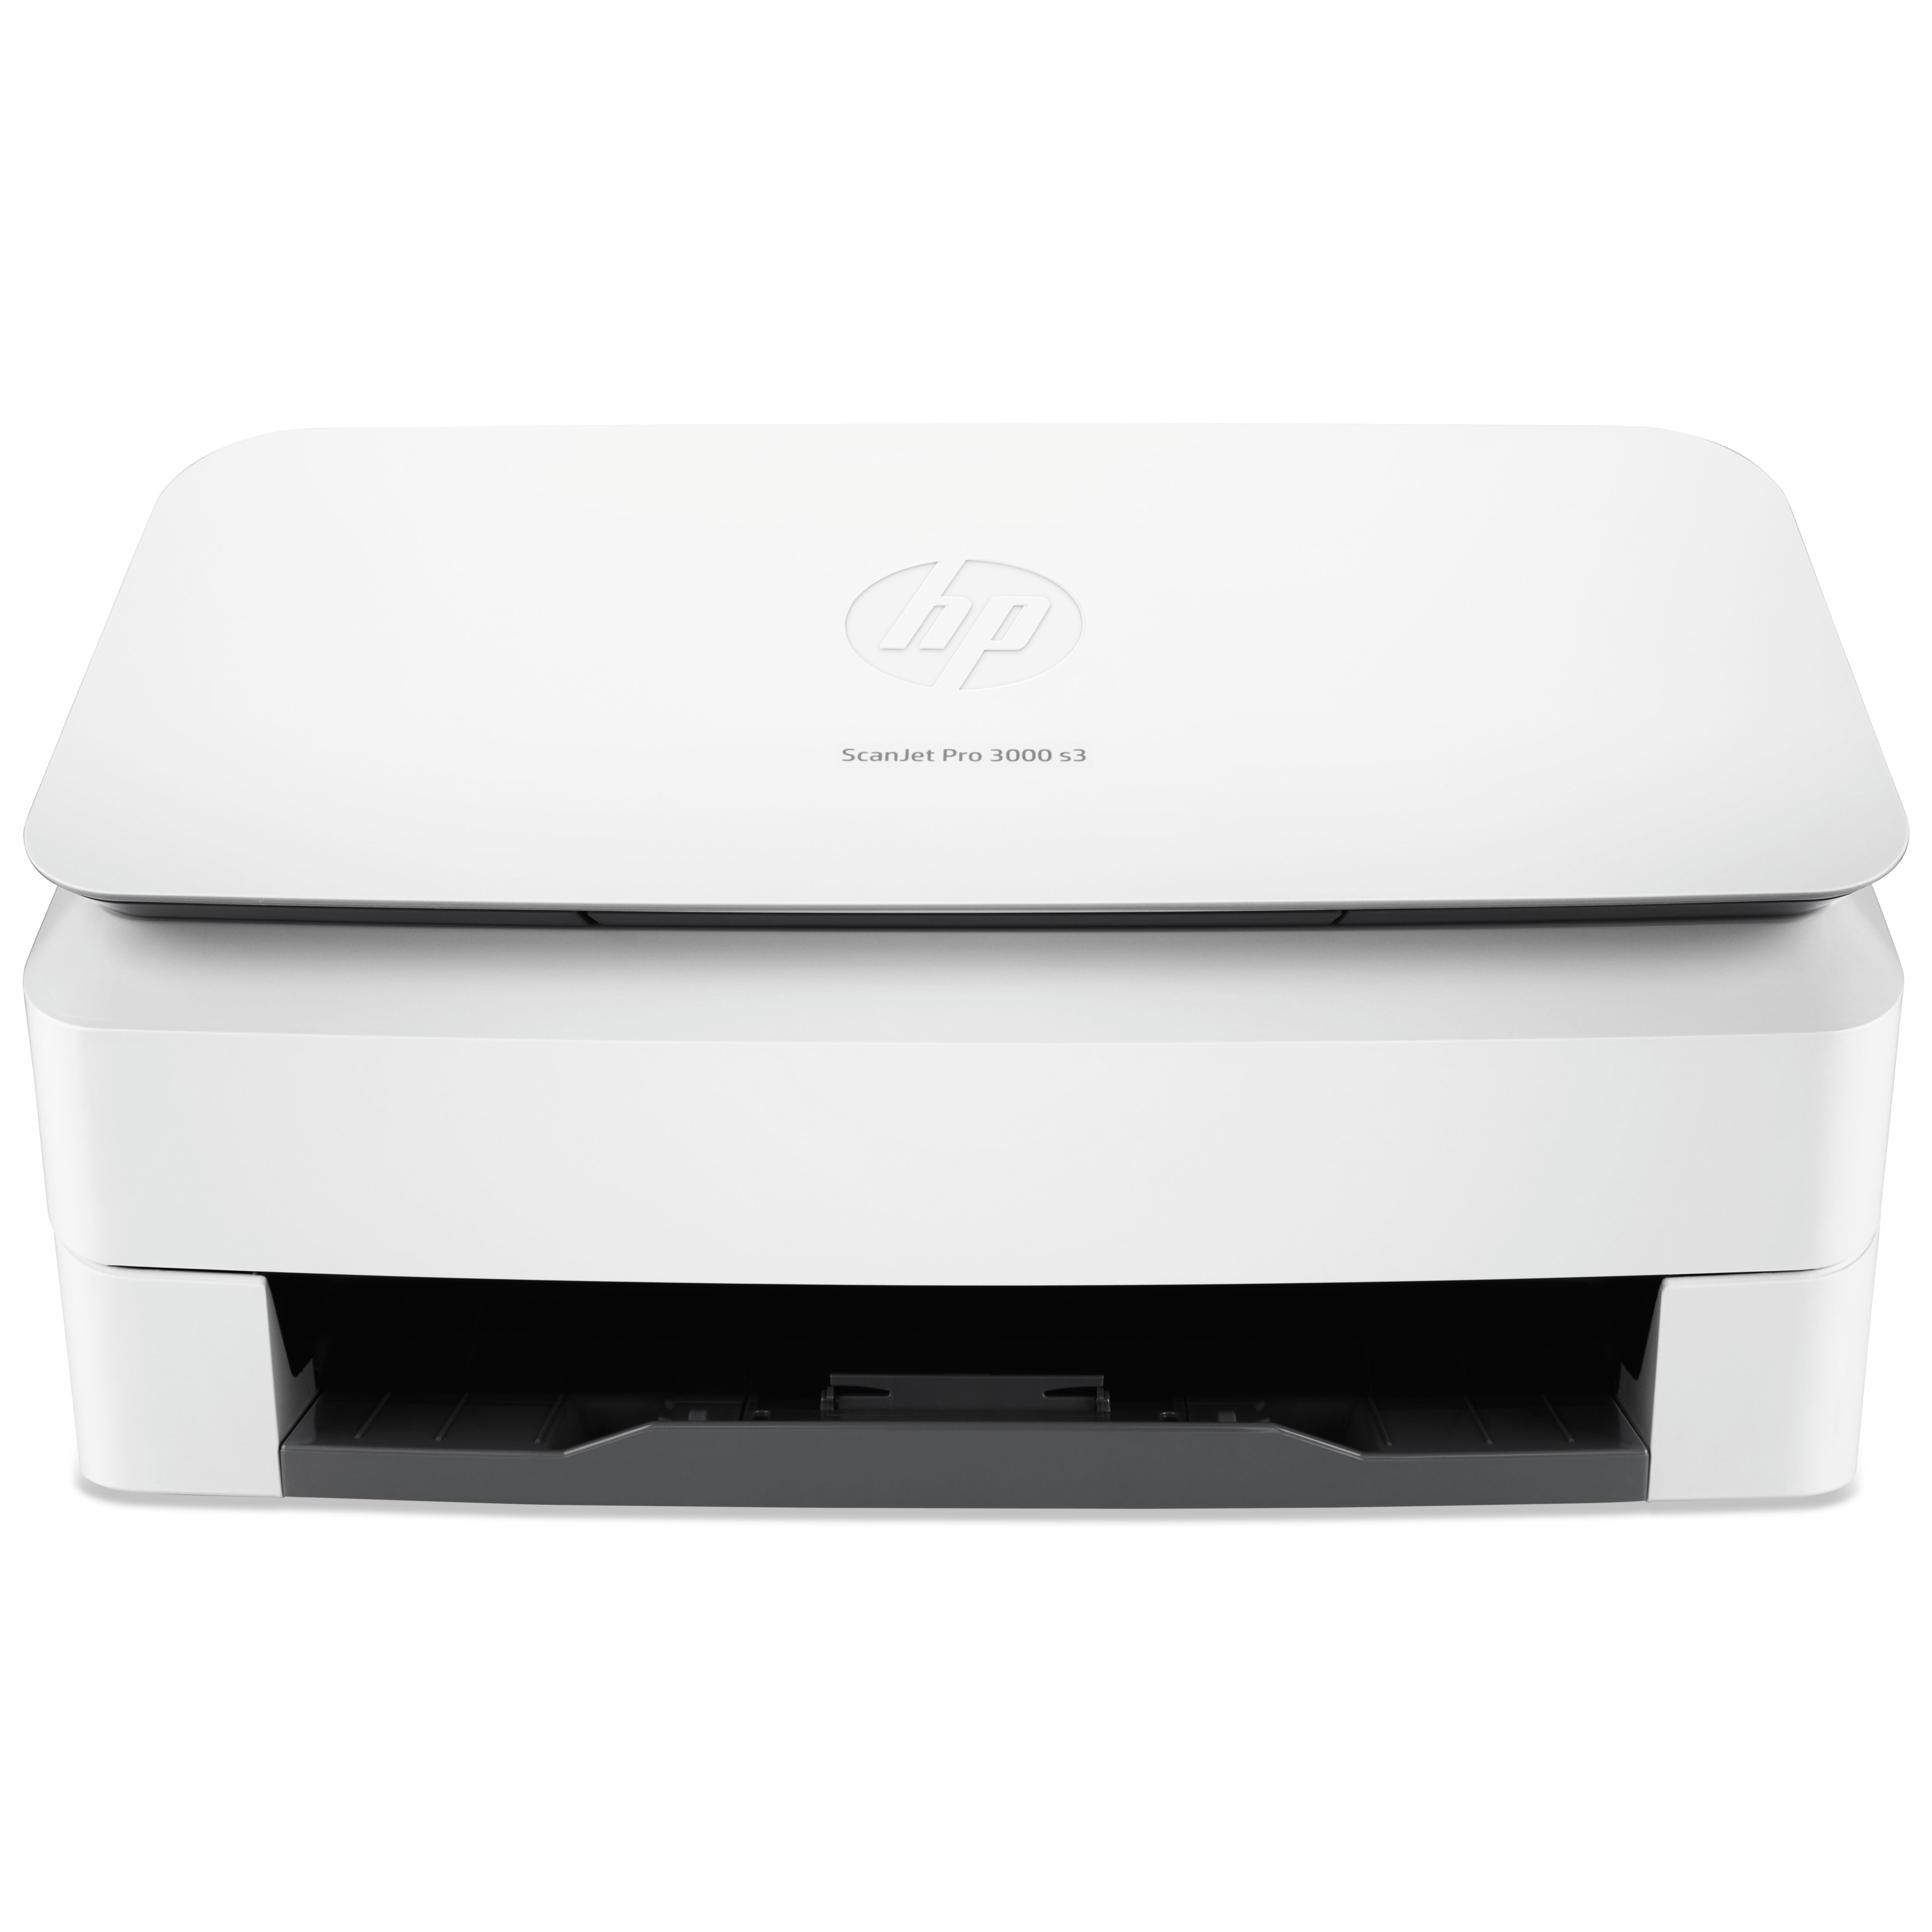 HP ScanJet Pro 3000 s3 Sheet-Feed Scanner, 600x600 dpi, 50-Sheet ADF -HEWL2753A